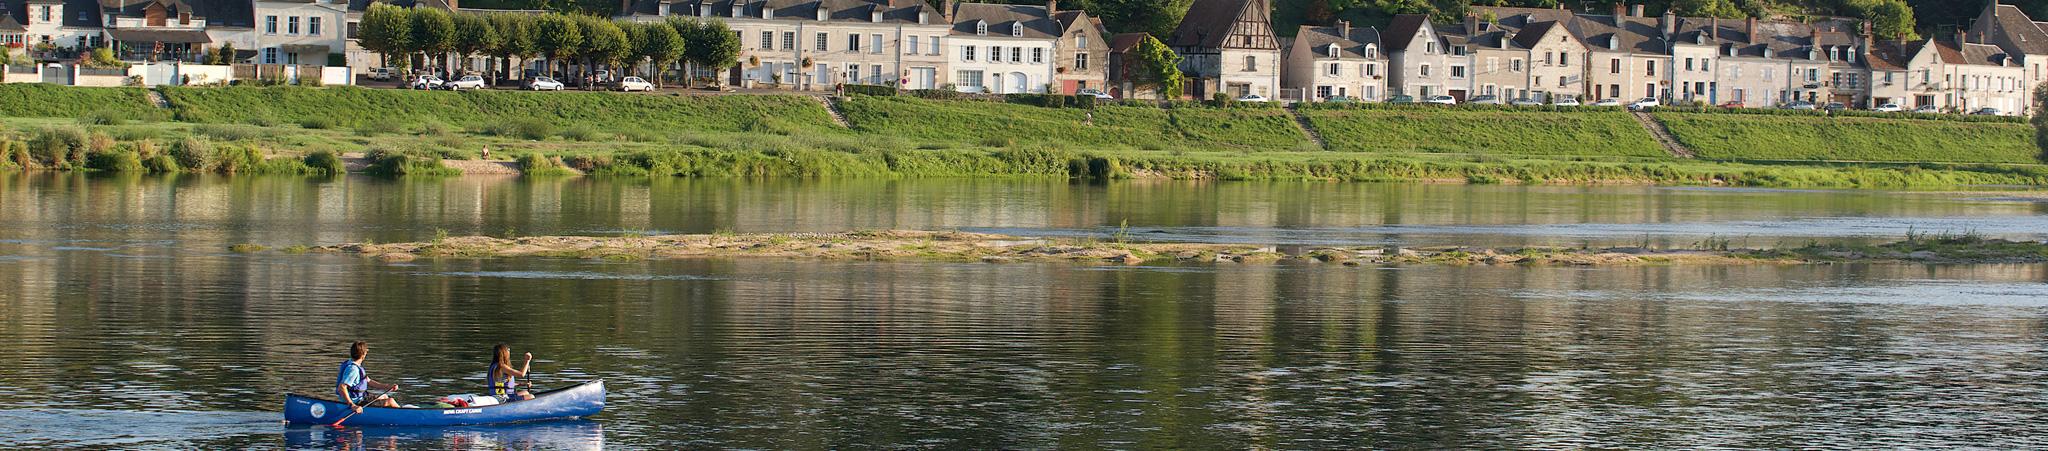 Tarifs Camping Loisir Blois